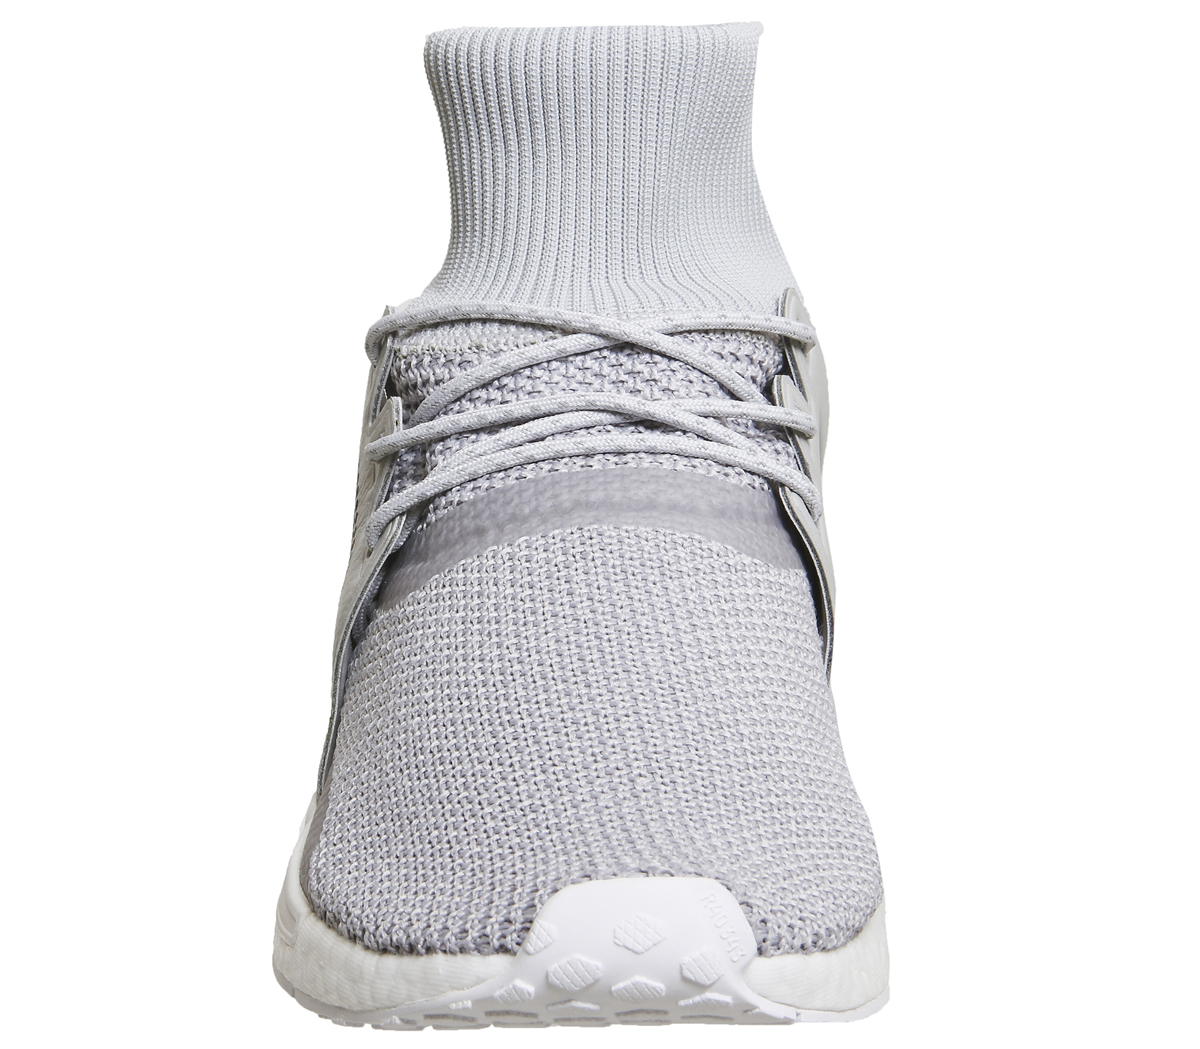 Adidas NMD ZR1 Winter grau zwei weiß Turn Schuhe